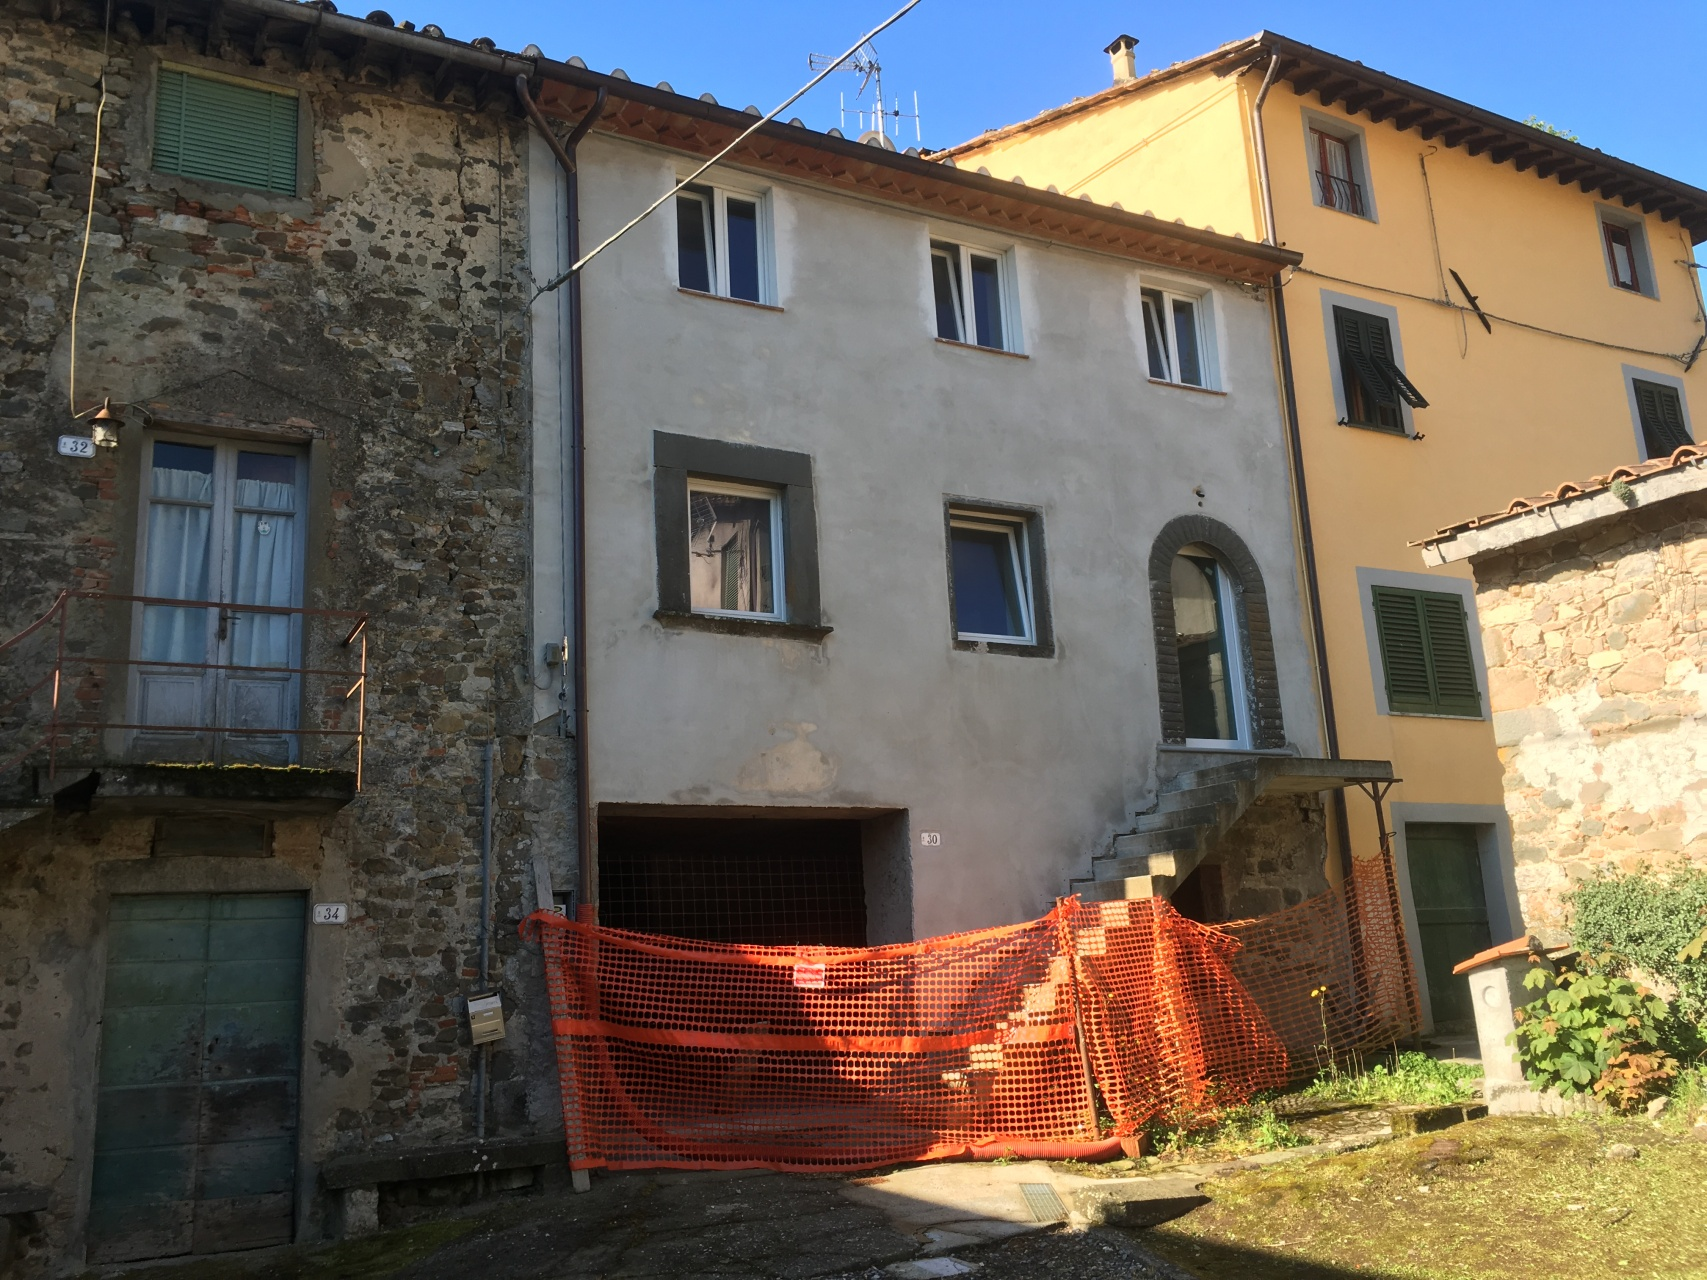 foto Casa di paese ristrutturata ma incompleta.